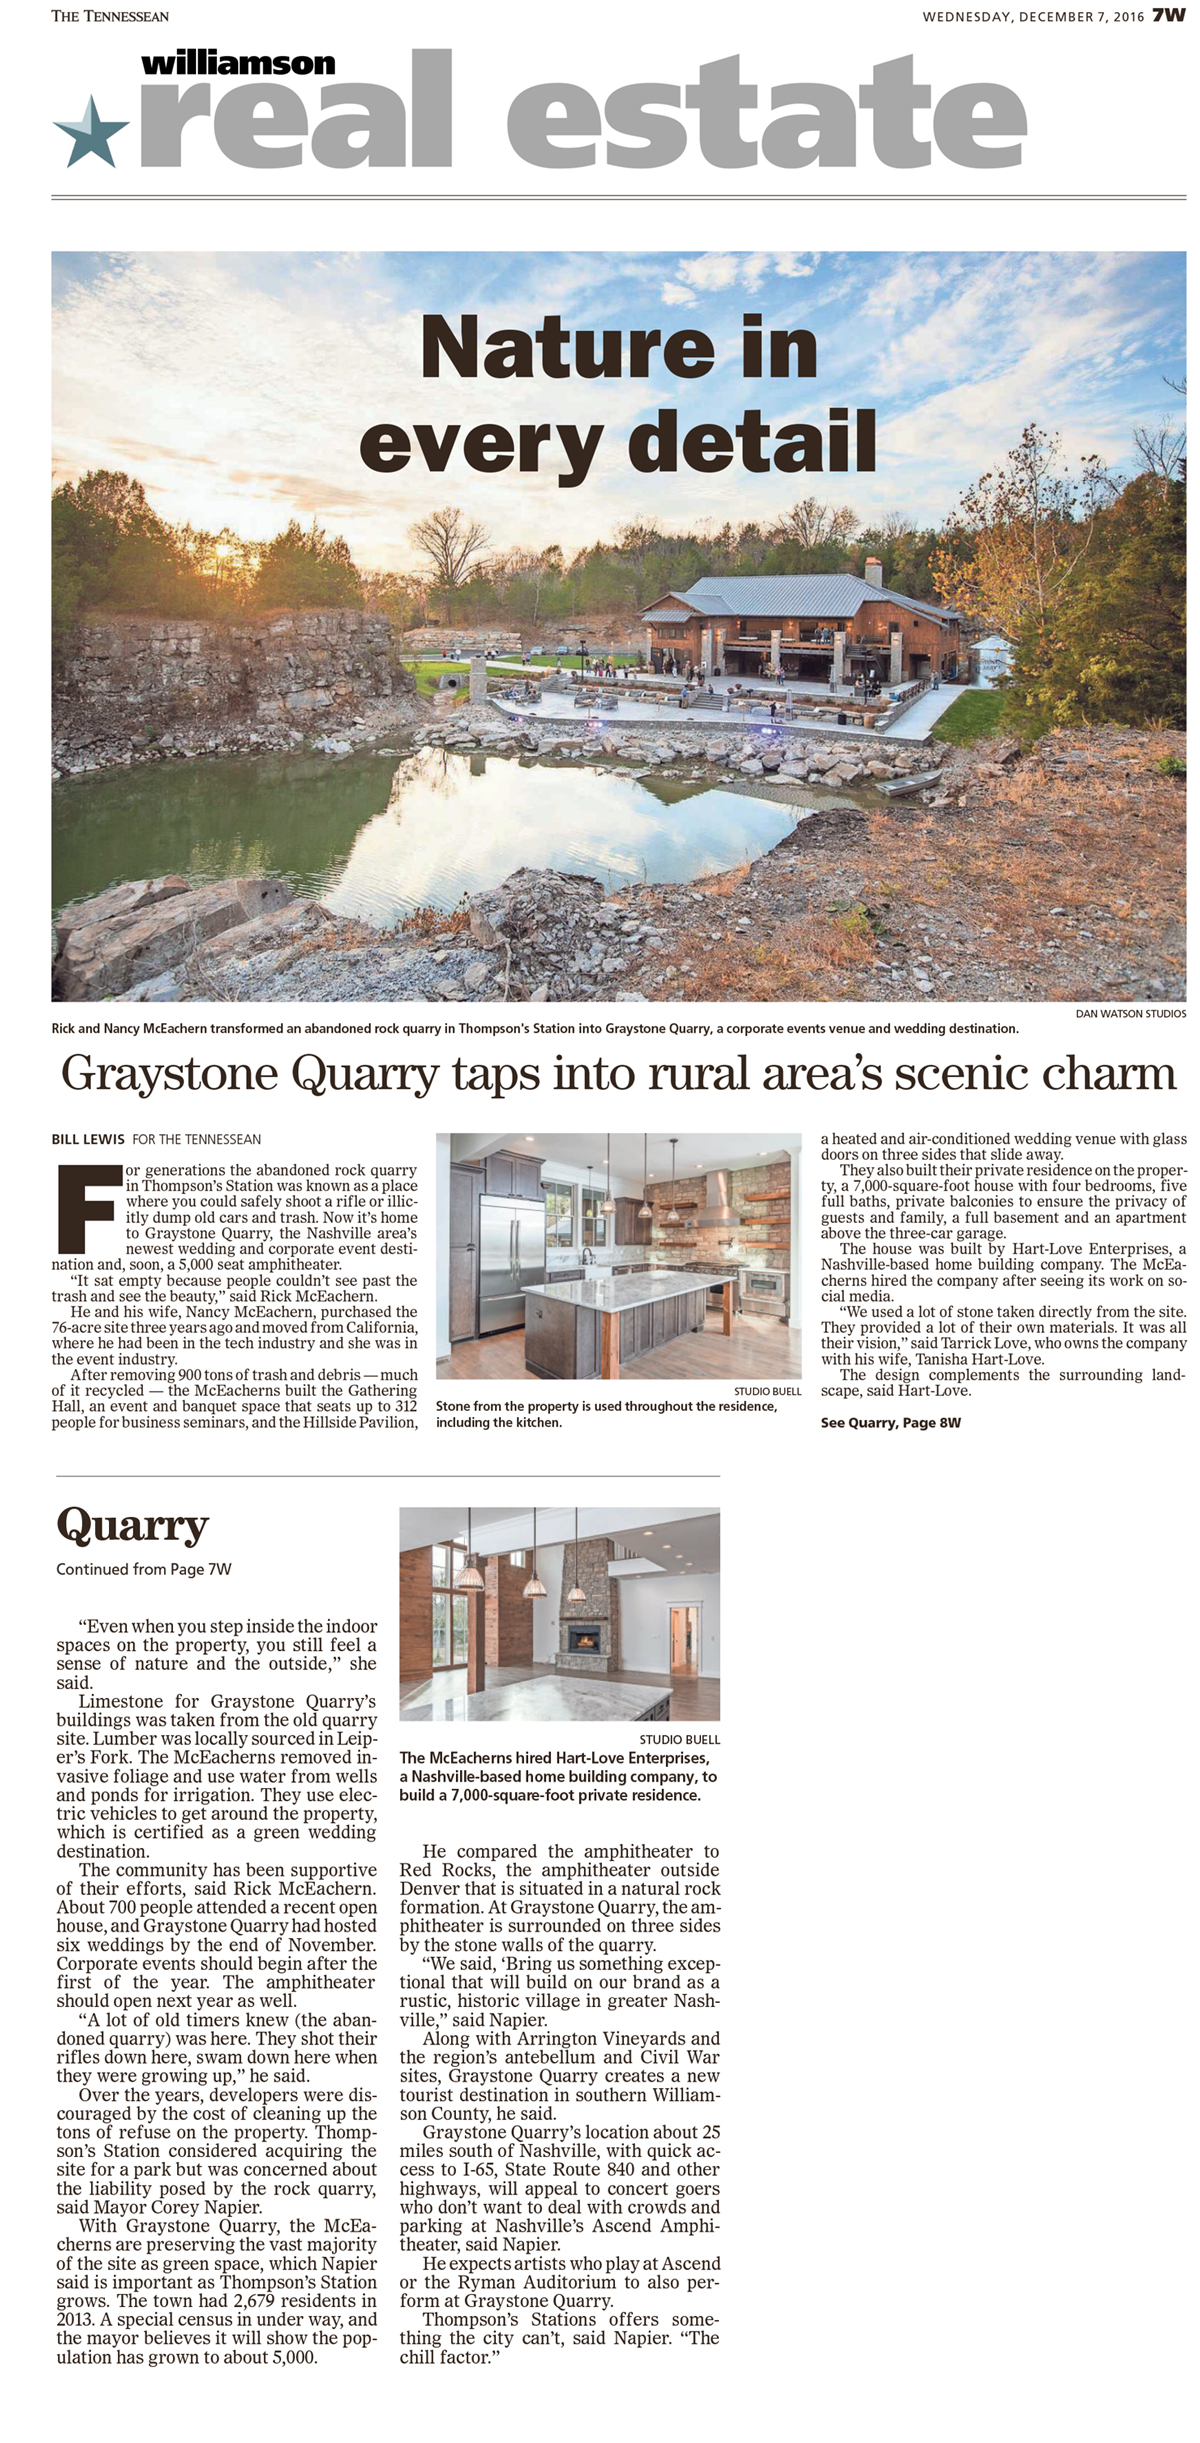 HL Renovates the historic Graystone Quarry